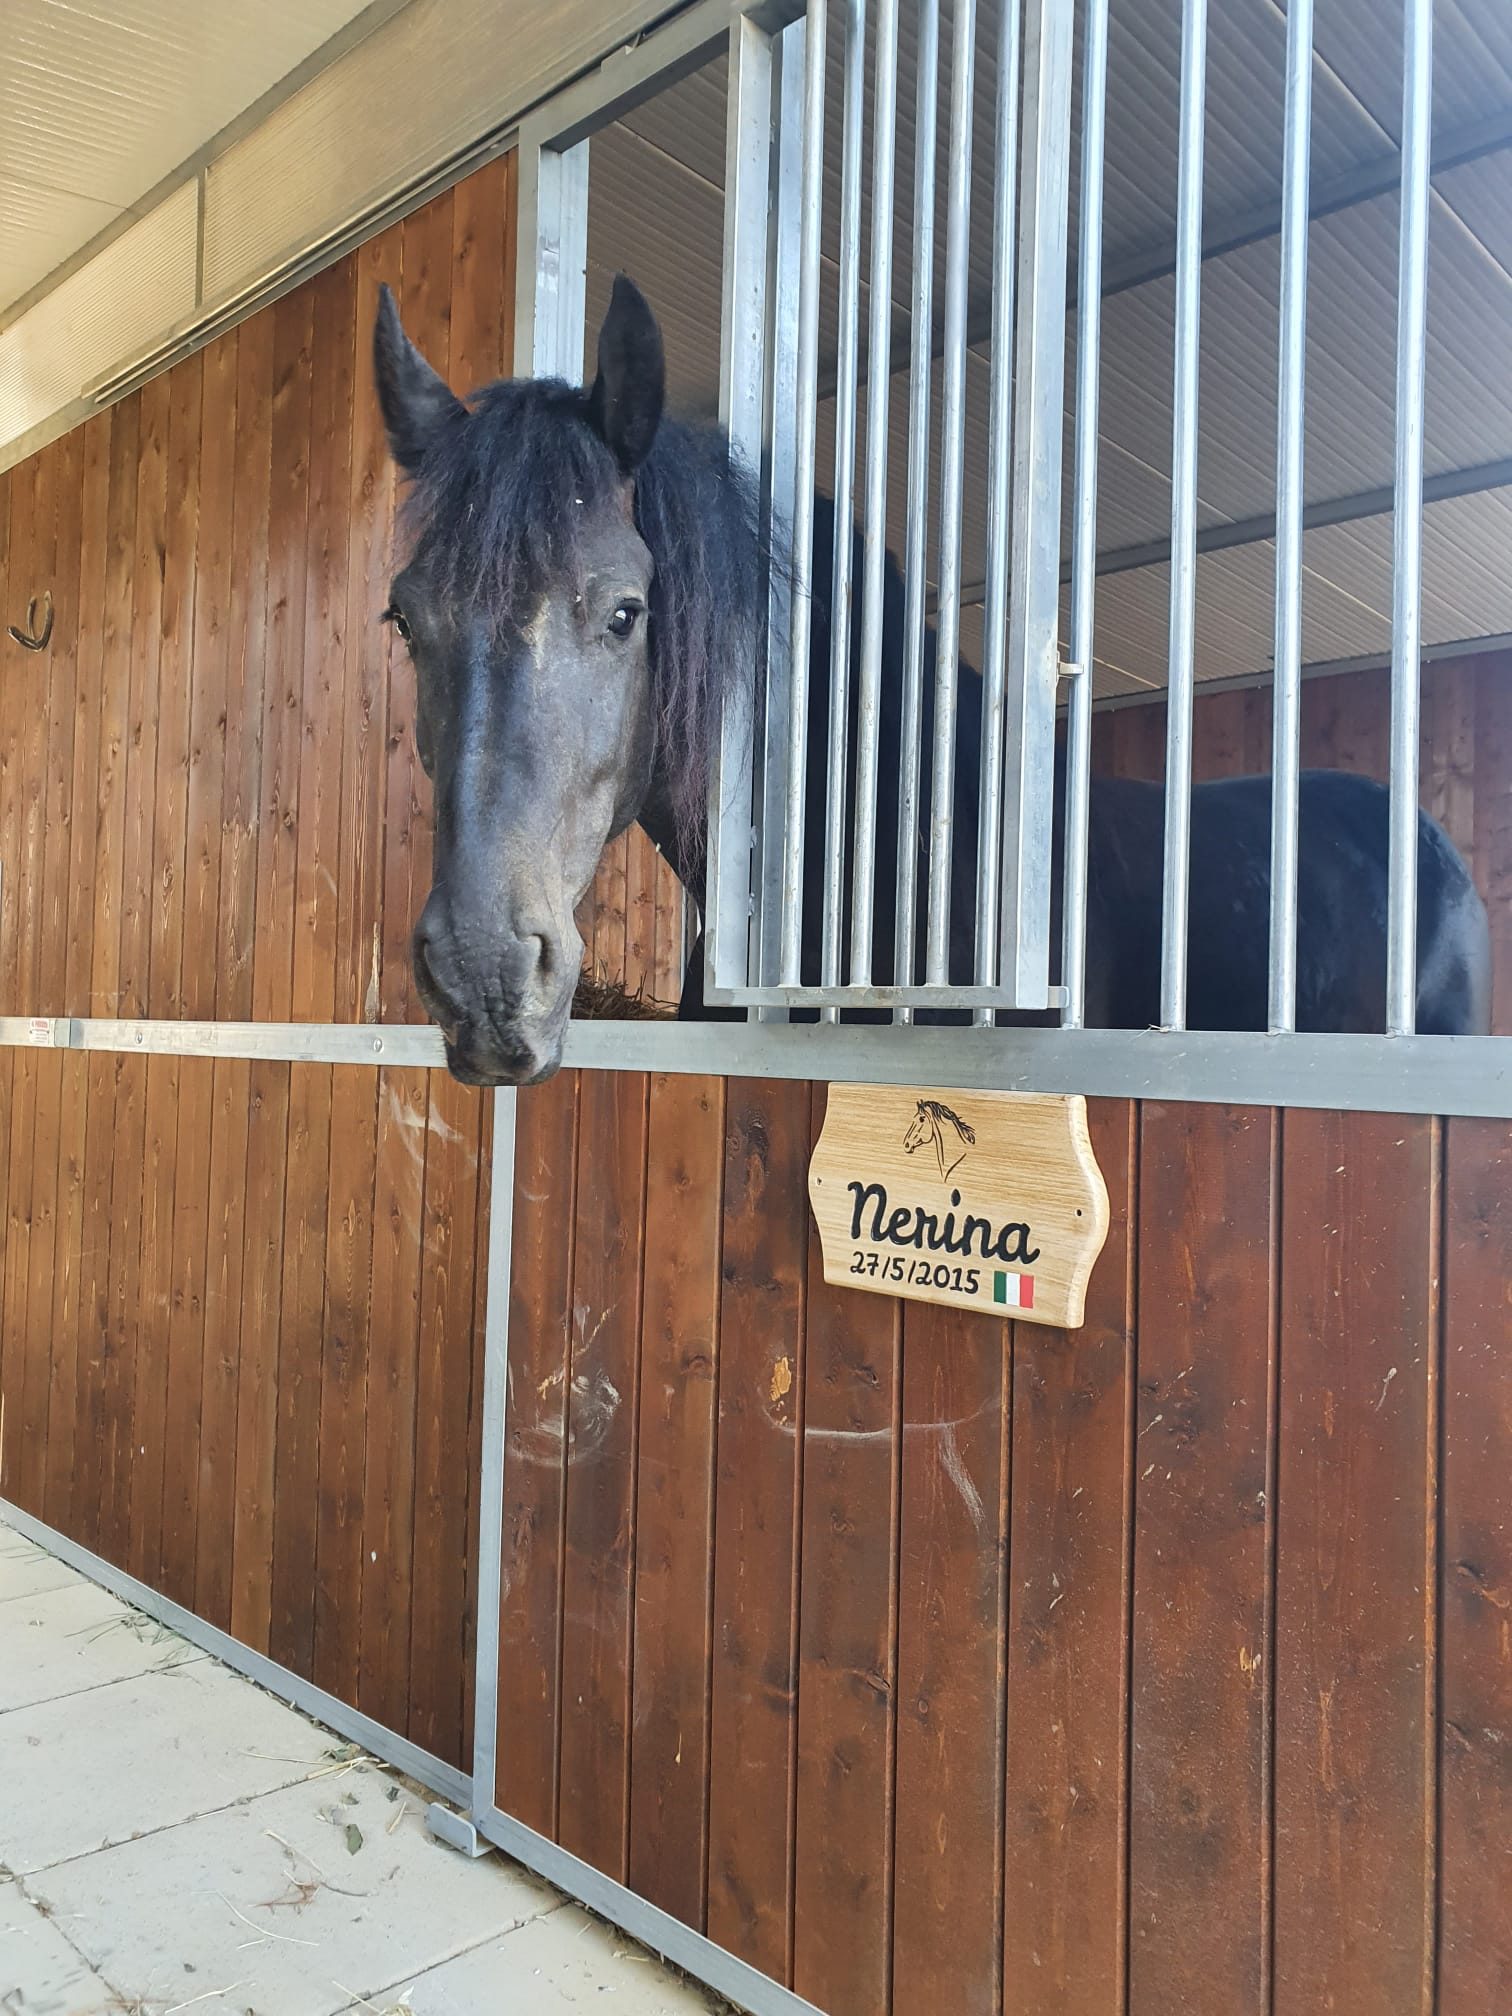 Targa Box Cavallo Maneggio Nerina